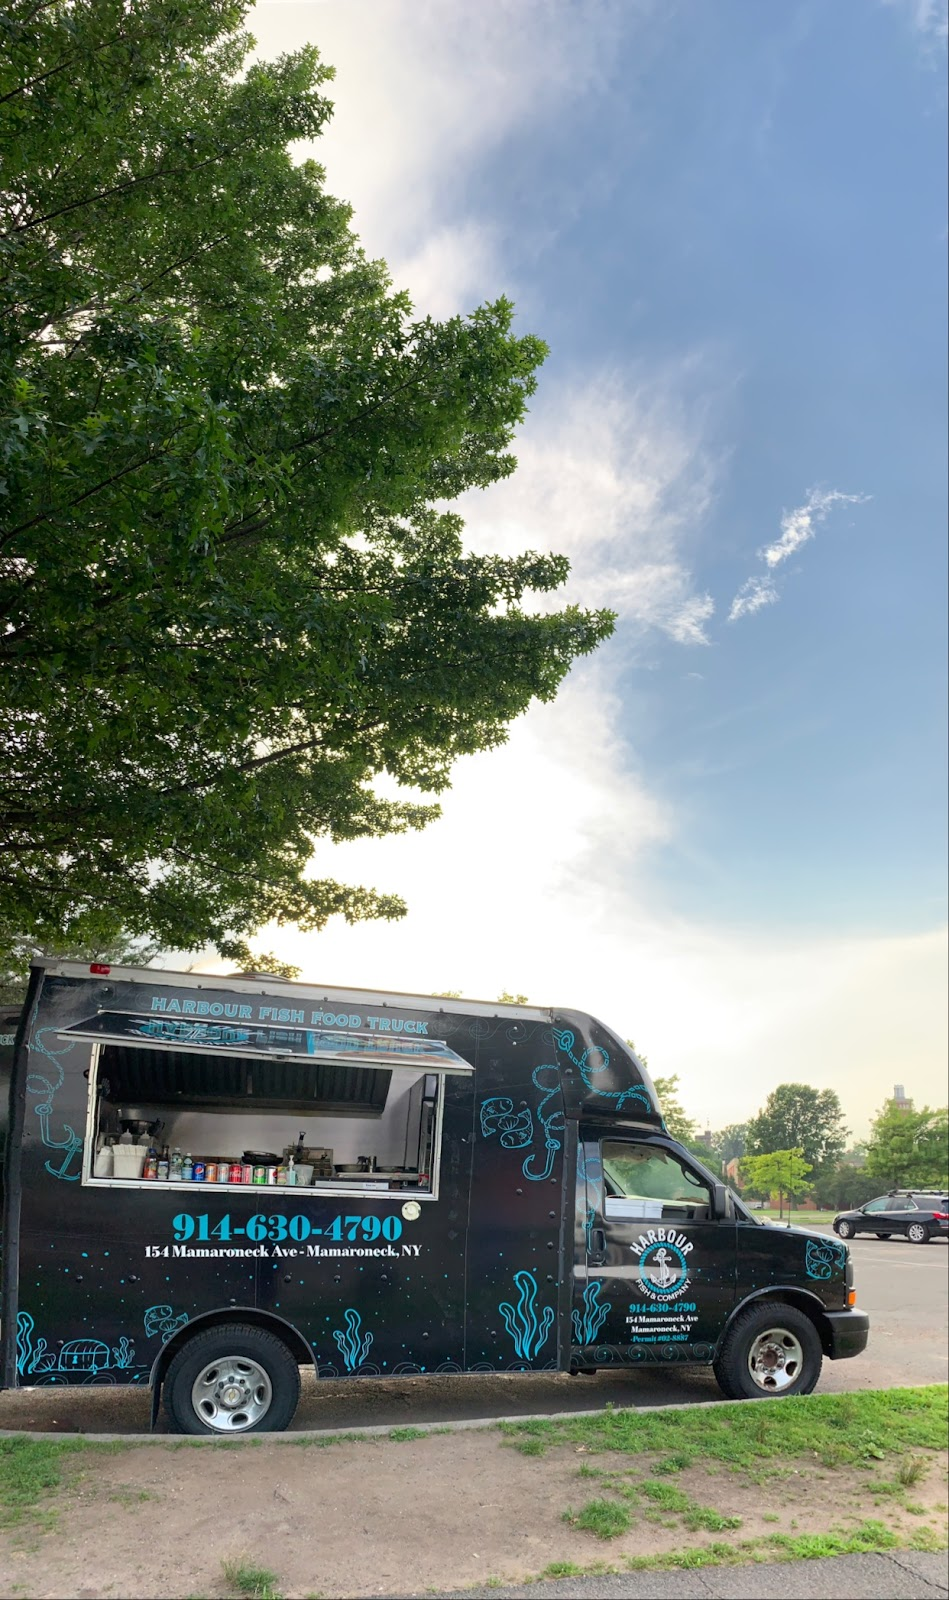 Harbour fish food truck | restaurant | 60-98 Harbor Island Park, Mamaroneck, NY 10543, USA